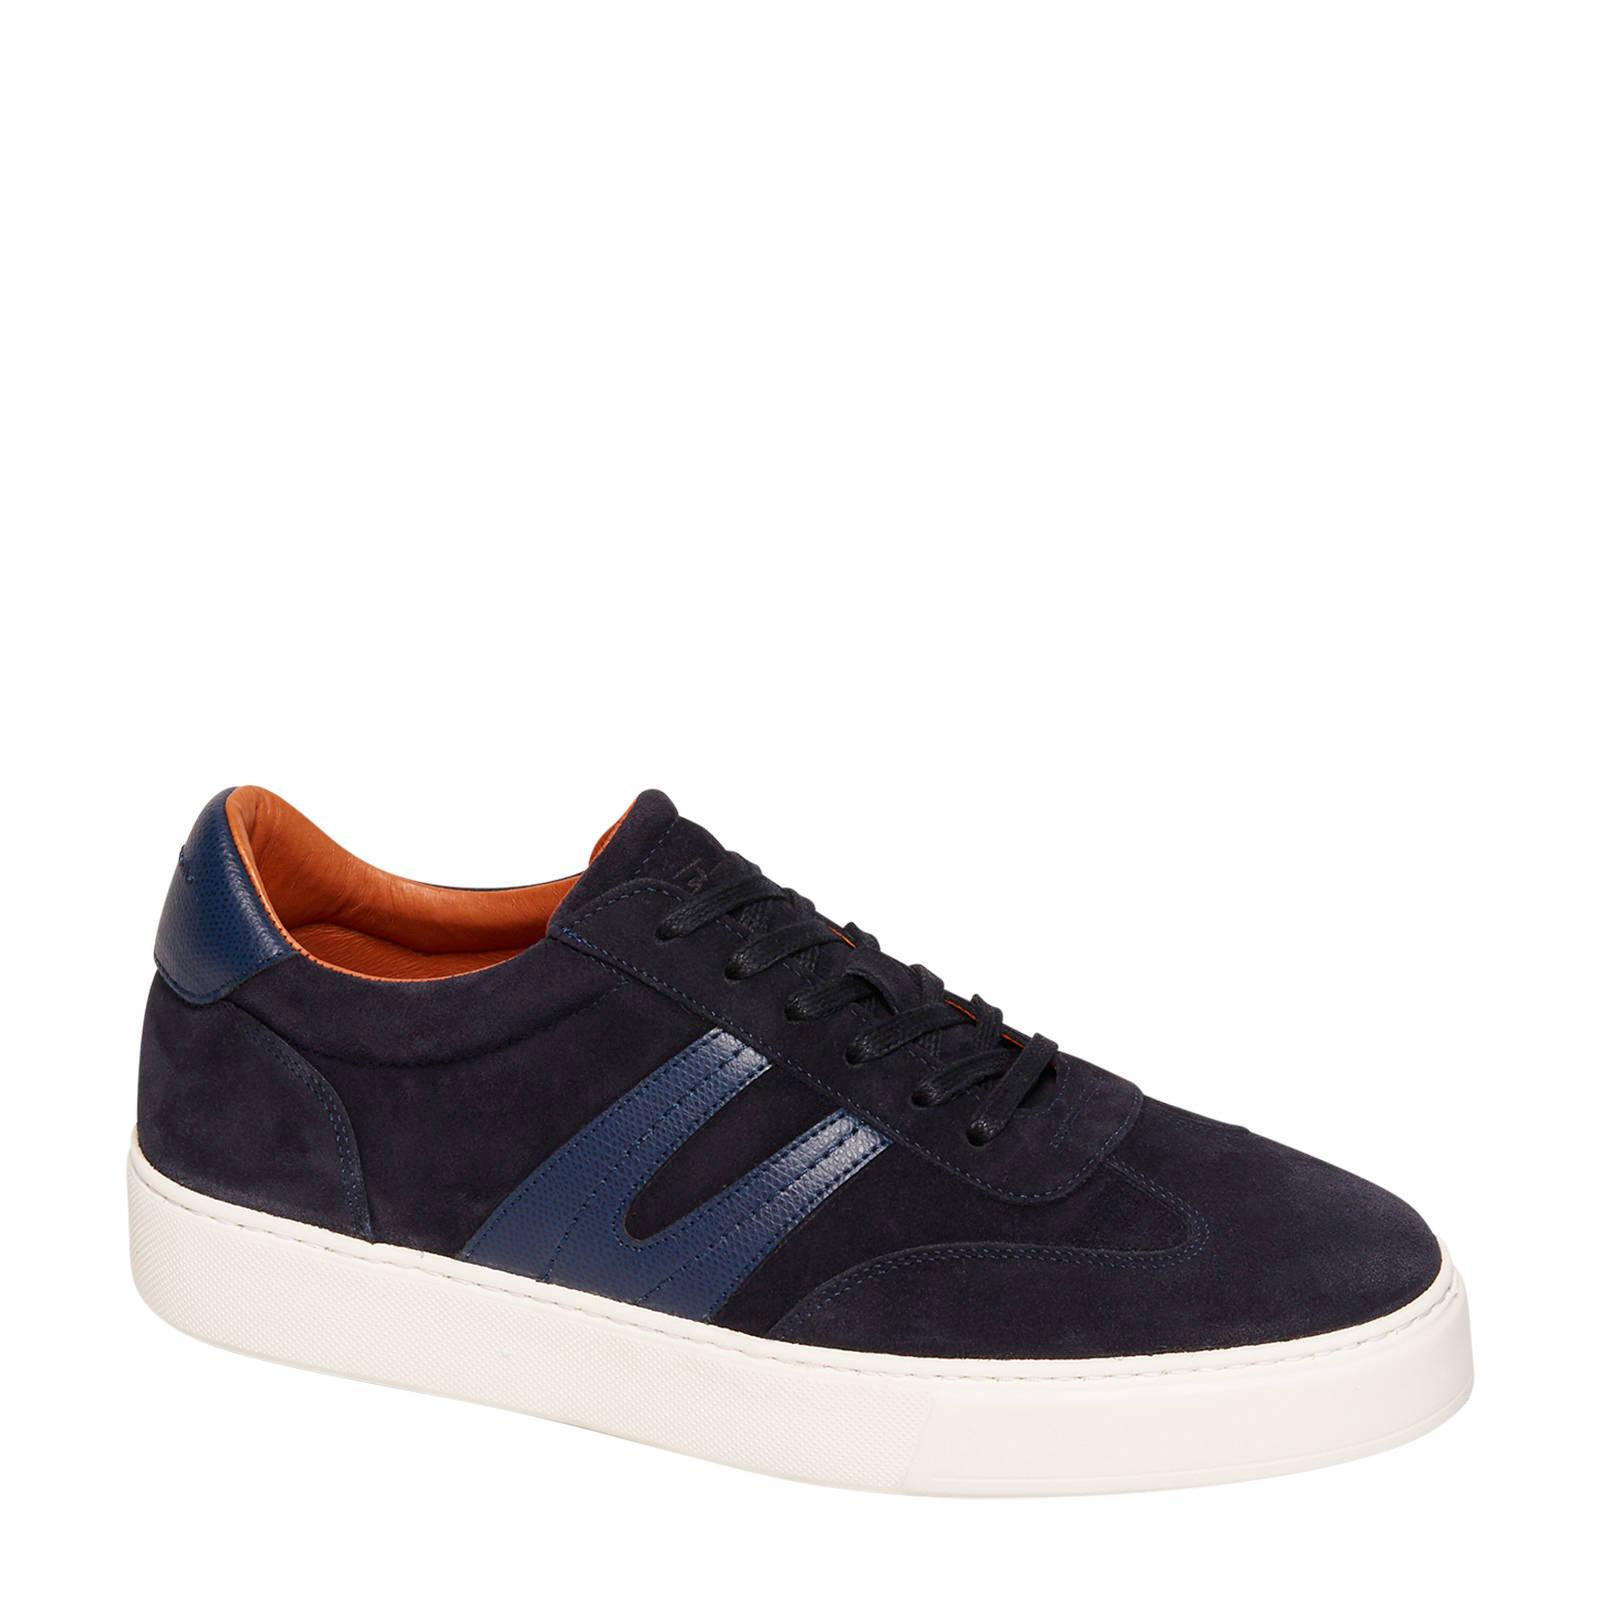 Van Lier Shoes Catawiki